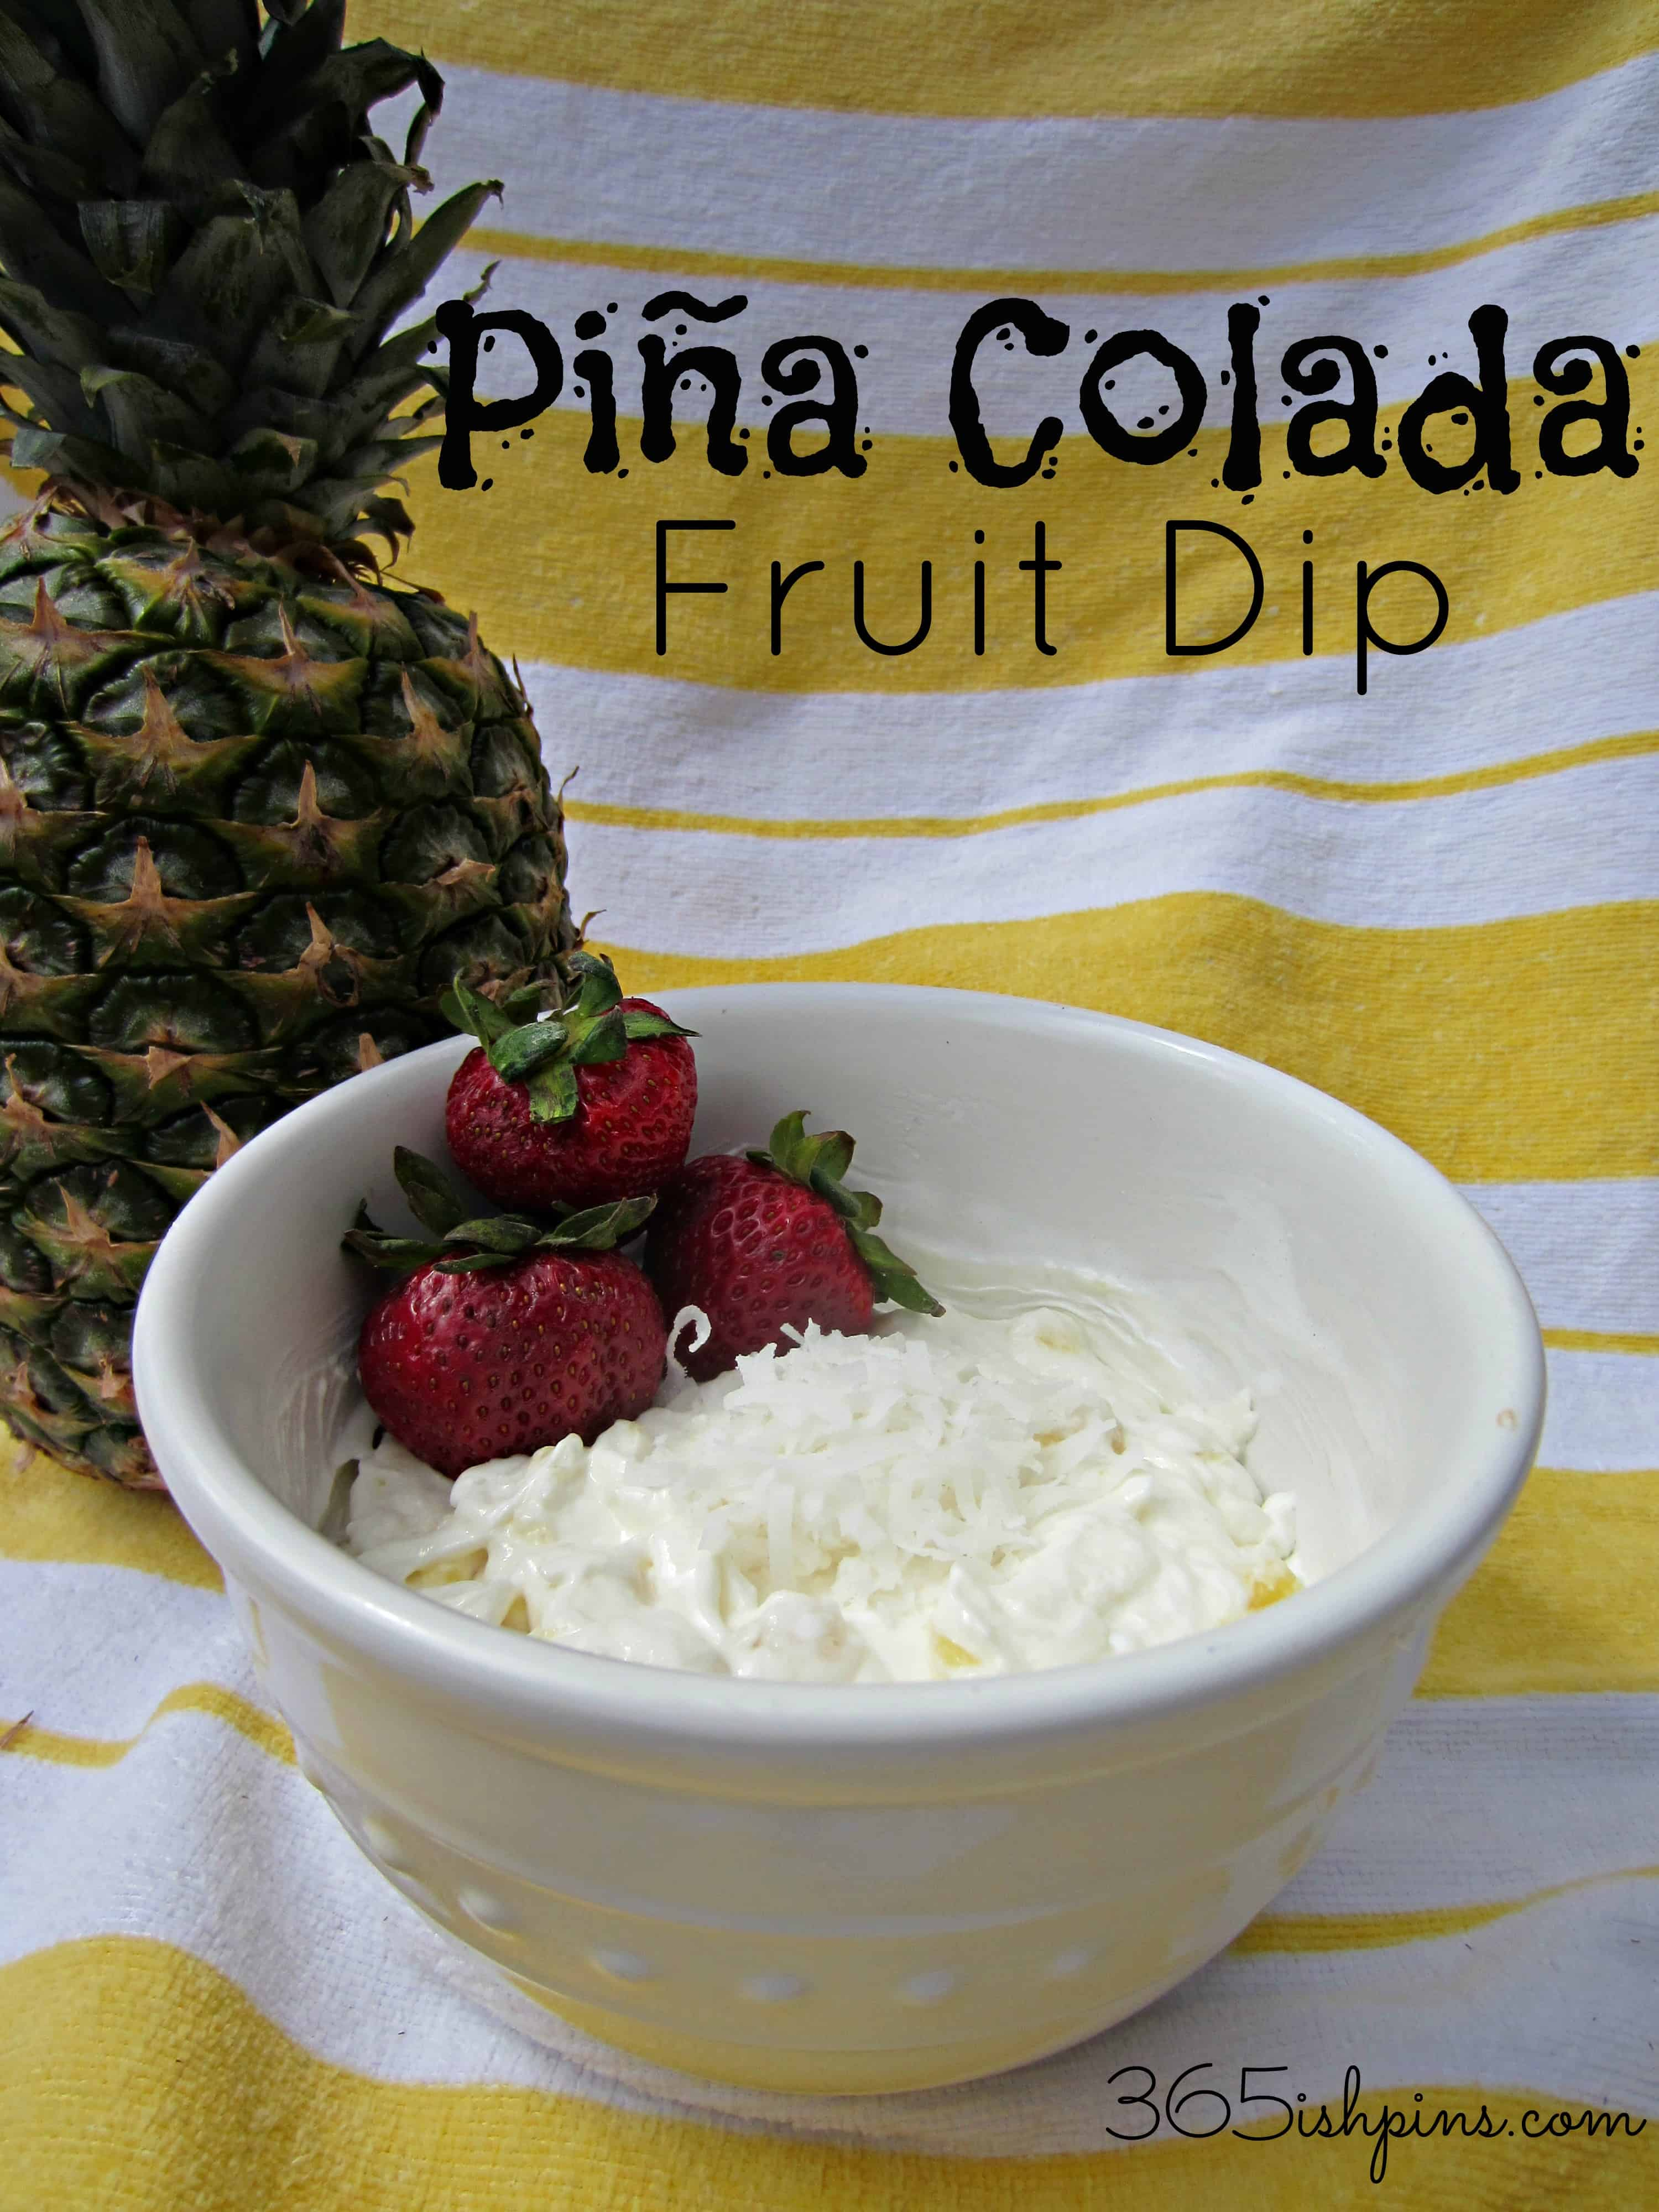 Day 345: Piña Colada Fruit Dip